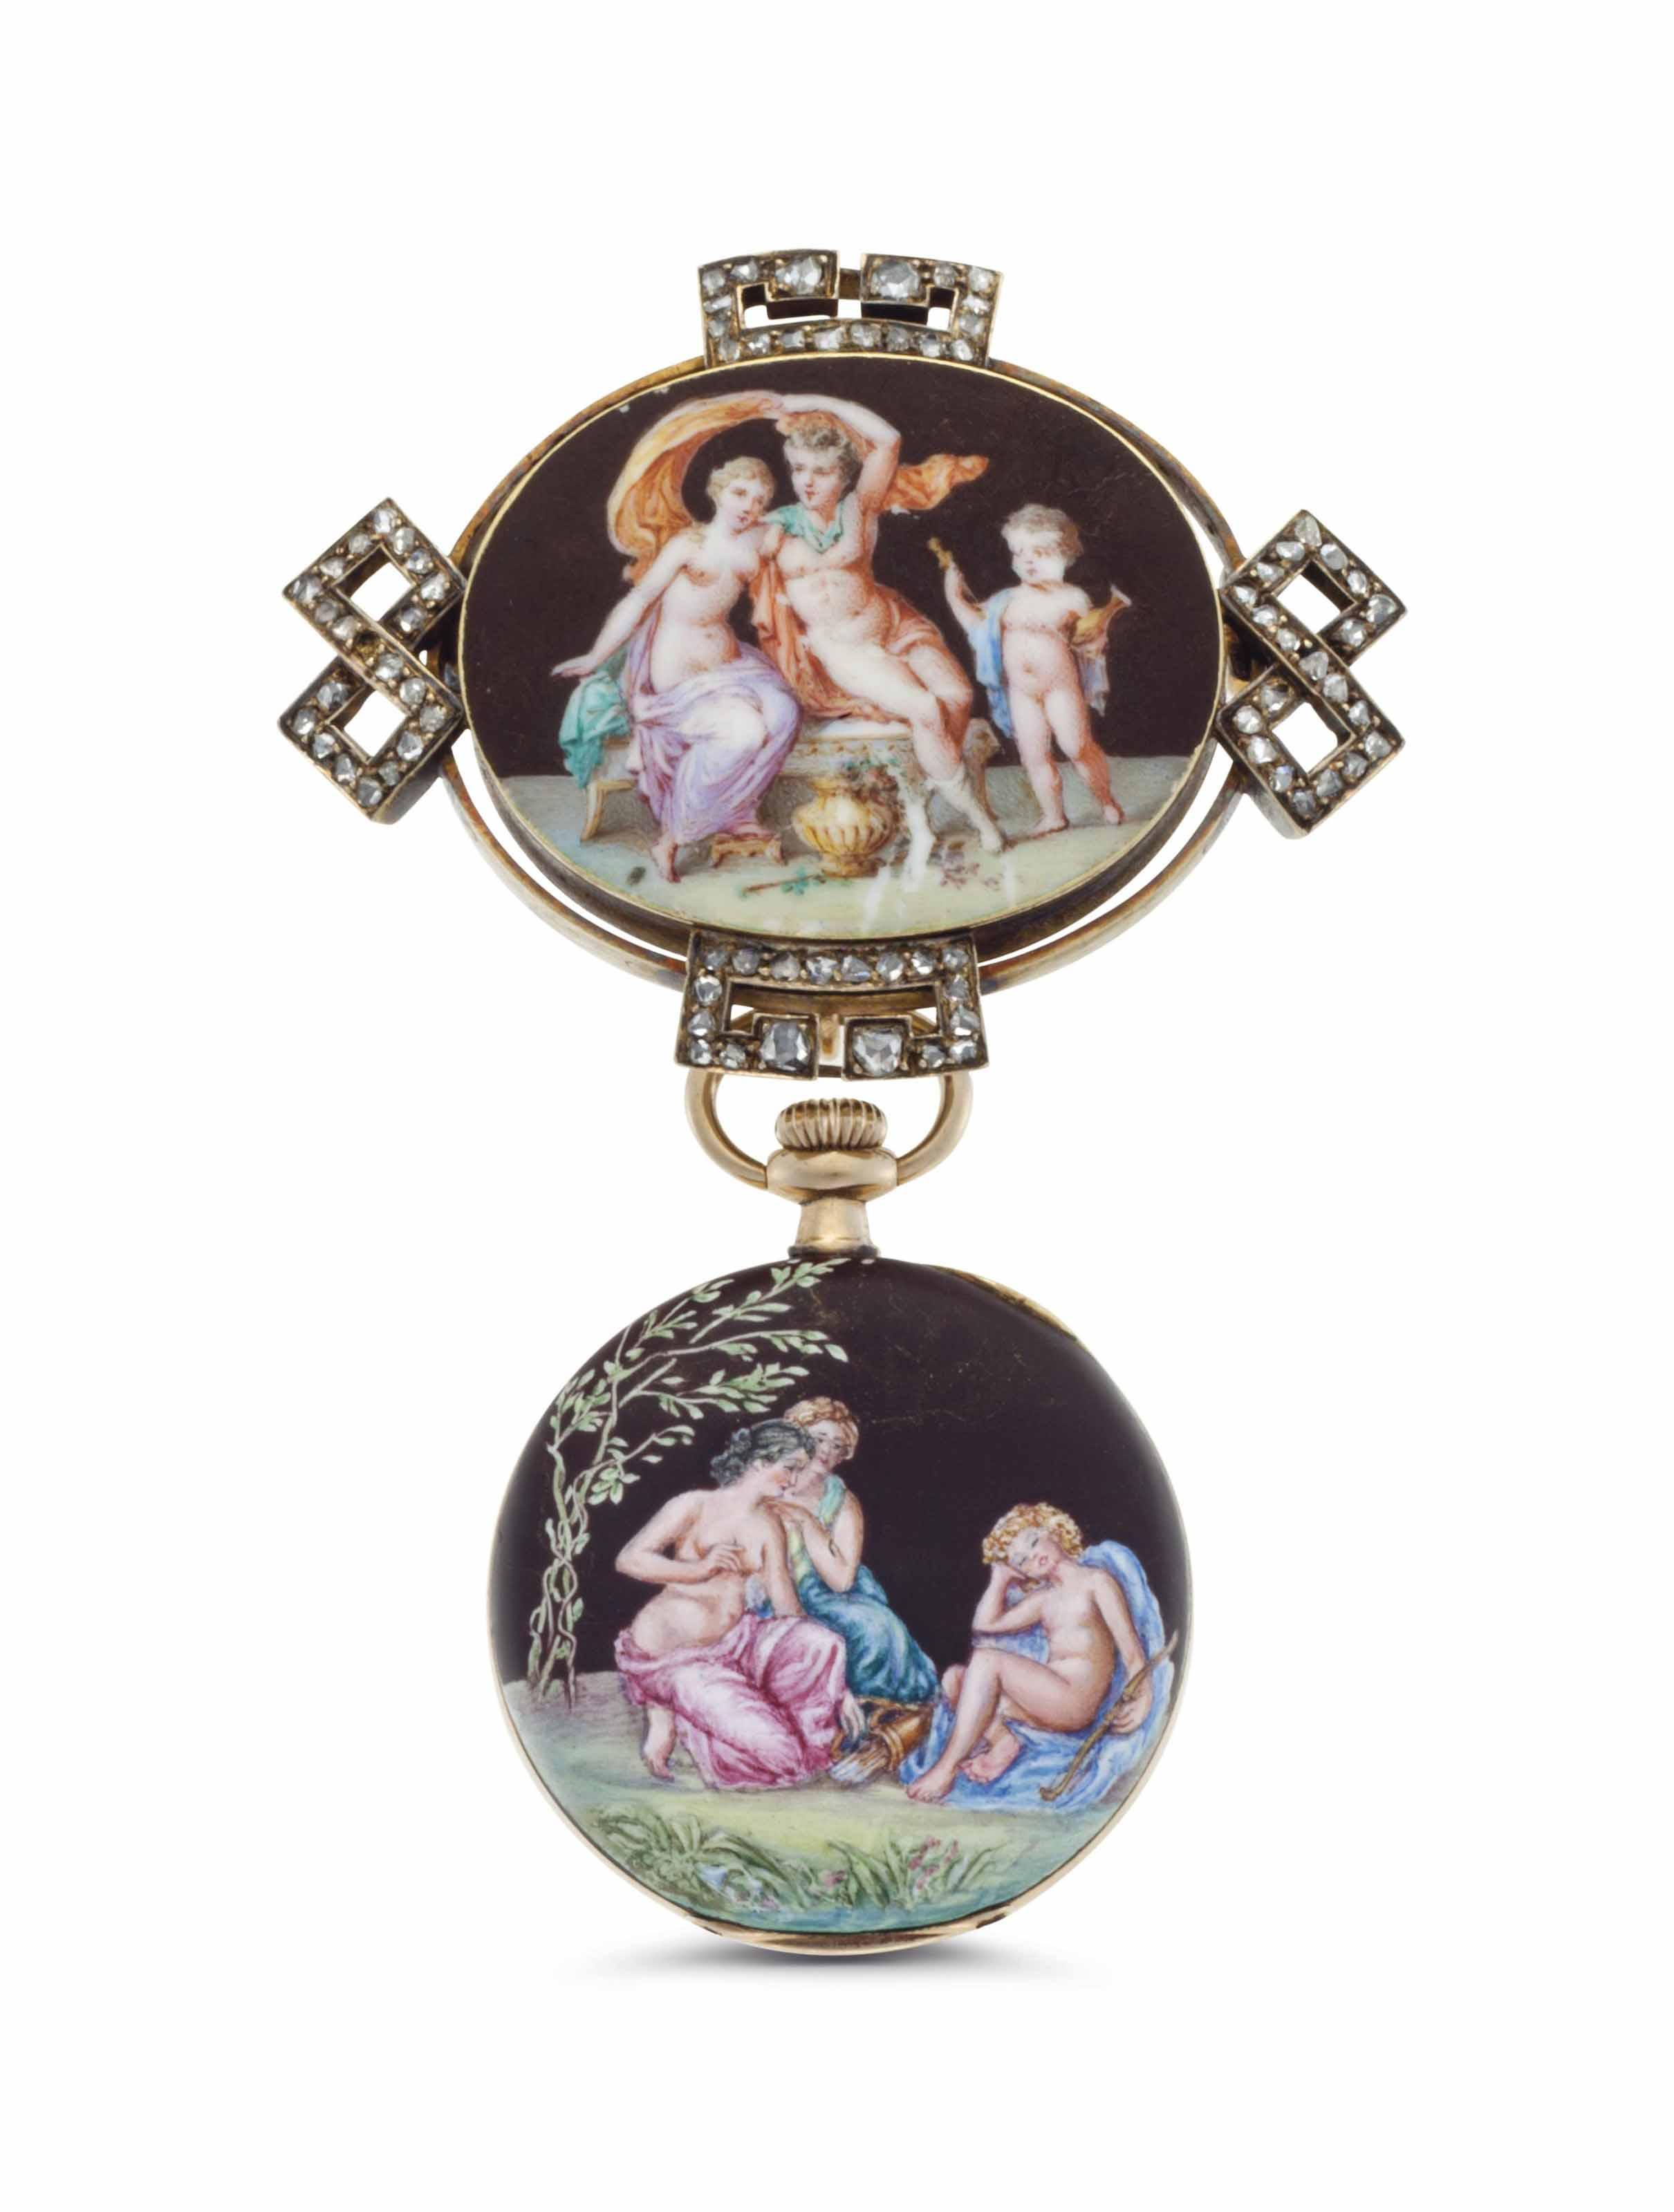 Longines. A Lady's 14k Gold, Diamond-set and Enamel Openface Keyless Lever Pendant Watch with Matching Pendant